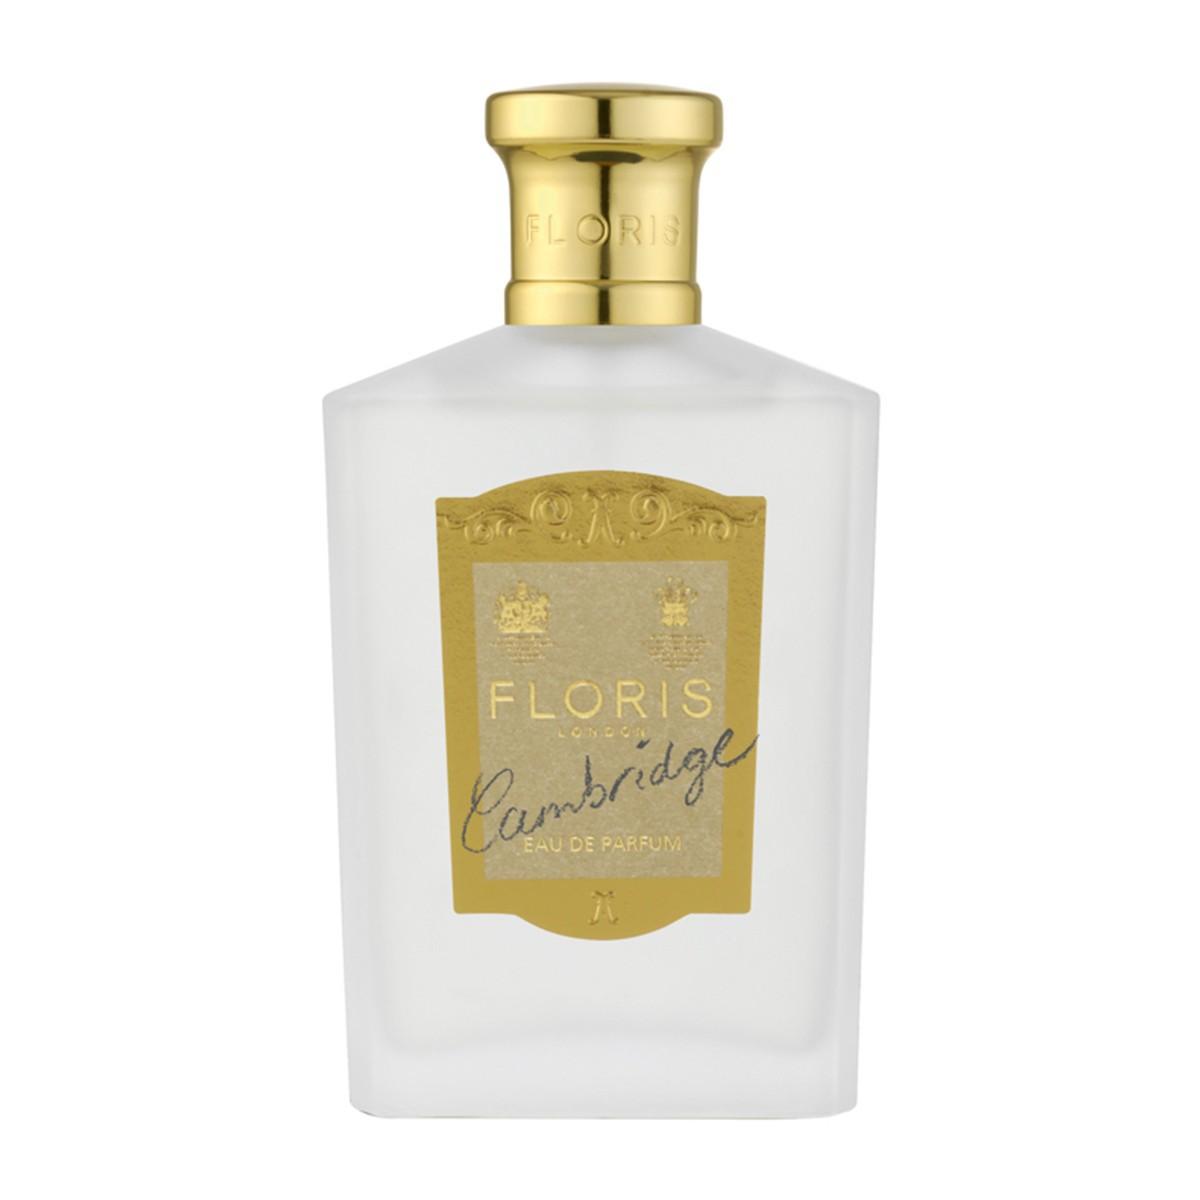 Floris Cambridge аромат для мужчин